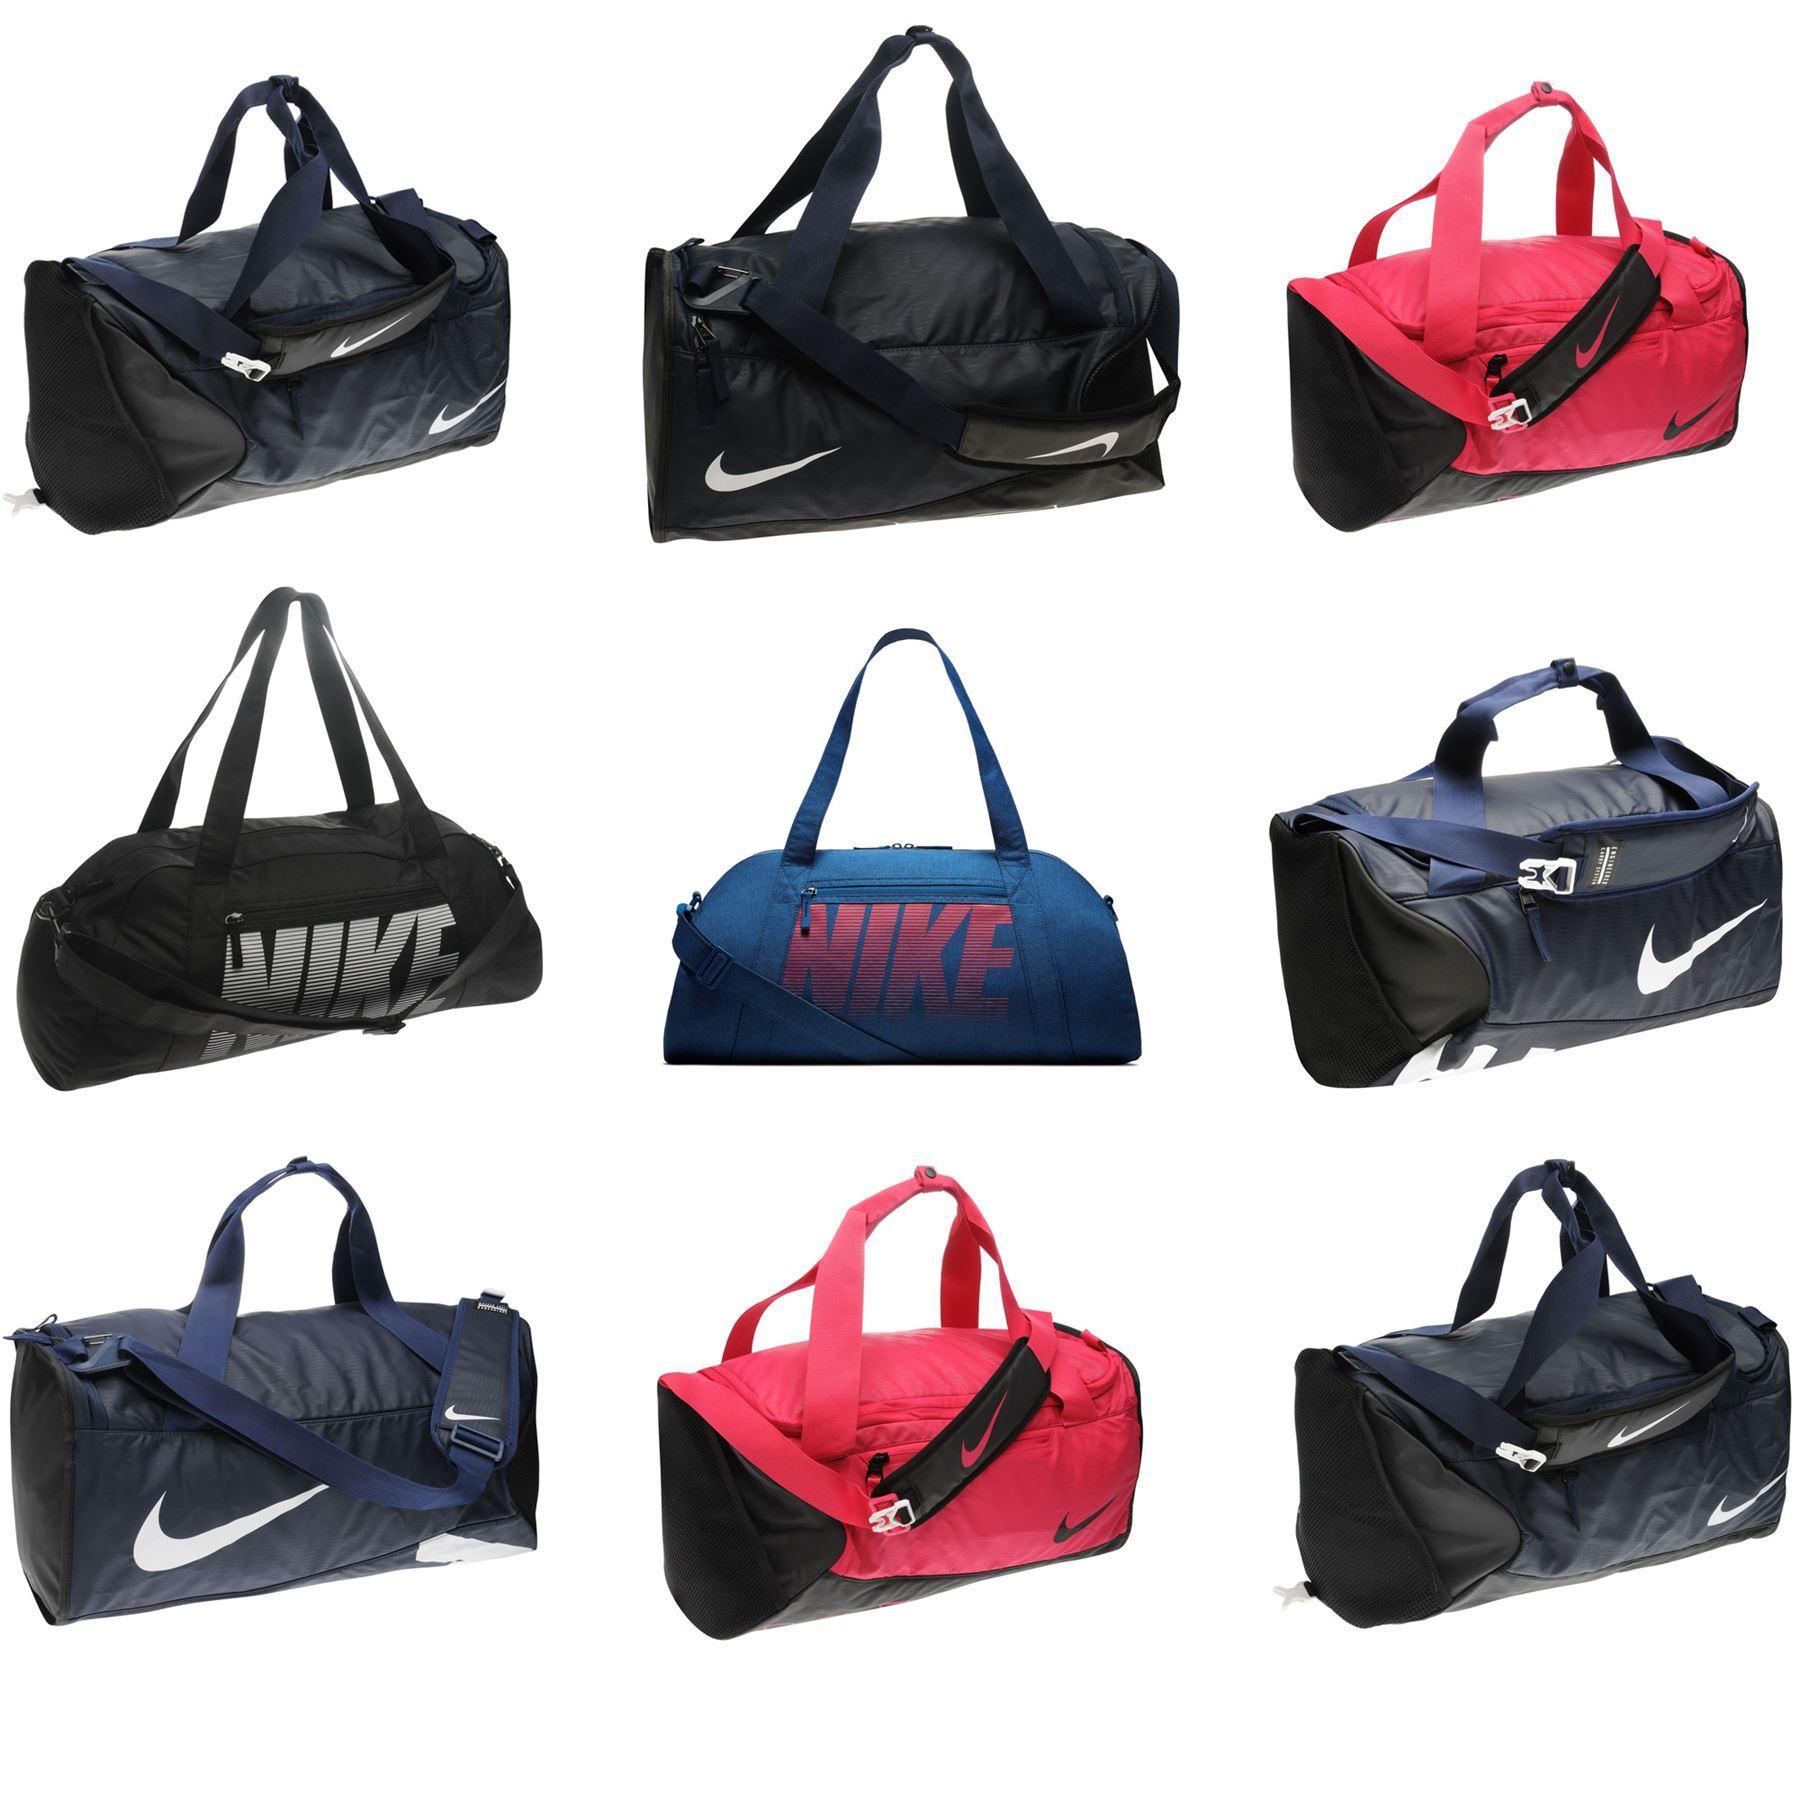 3cefb5e83c20 Details about Nike Duffel Bag Carryall Holdall Barrel Bag Daybag Kitbag  Gymbag